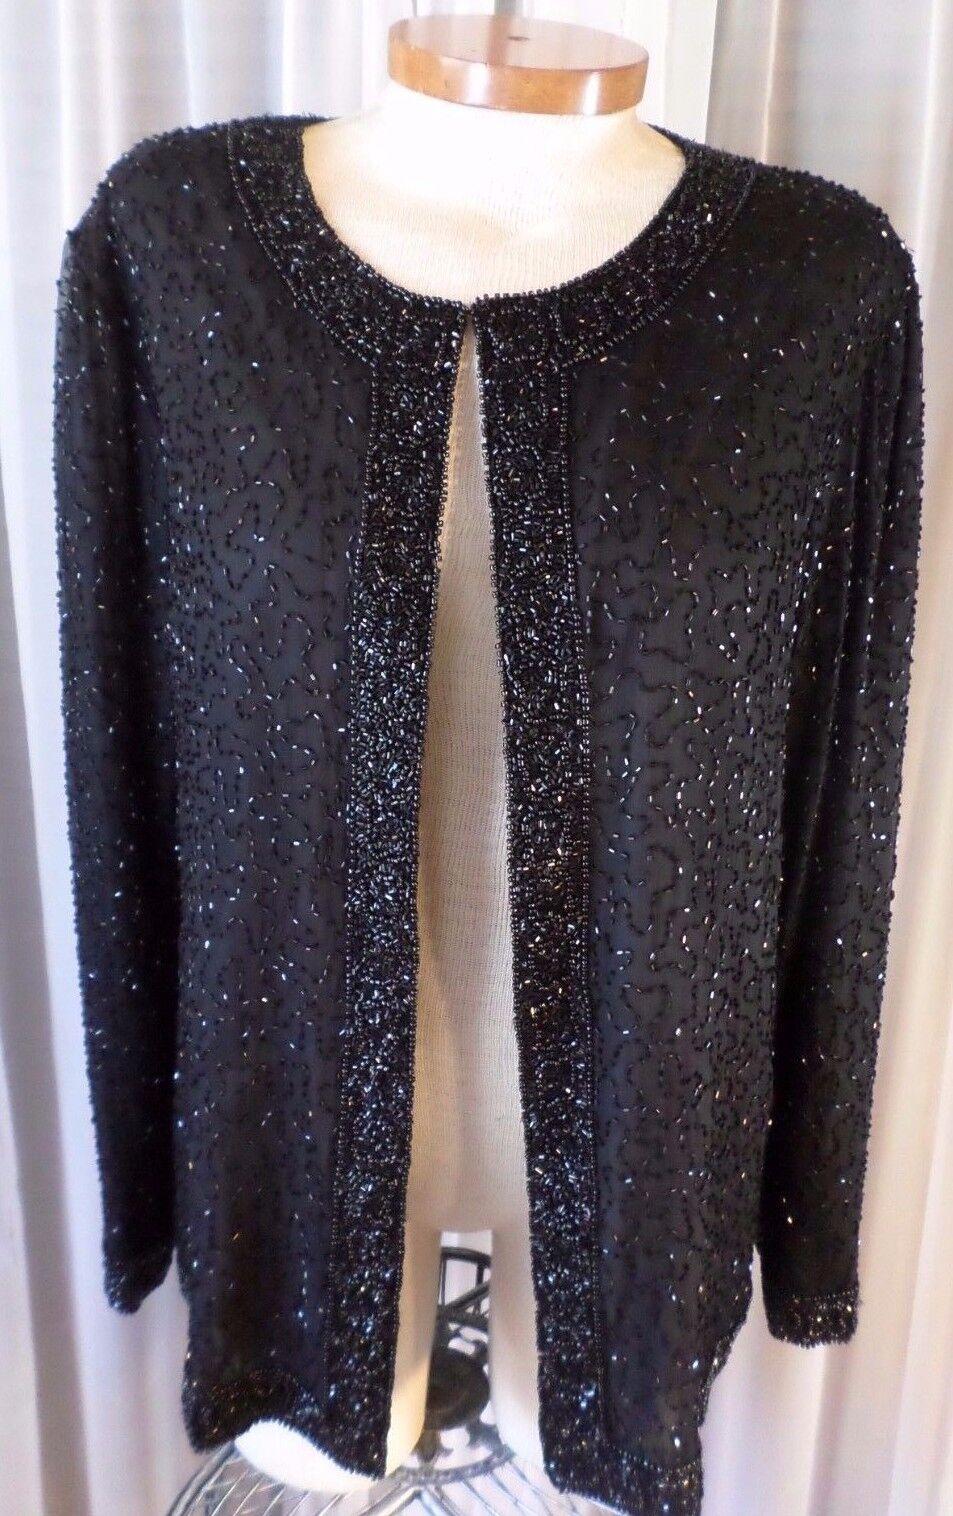 Vintage schwarz PM Woman Silk Beaded Lady Jacket Petite Medium 8P Top Beads J.L.M.